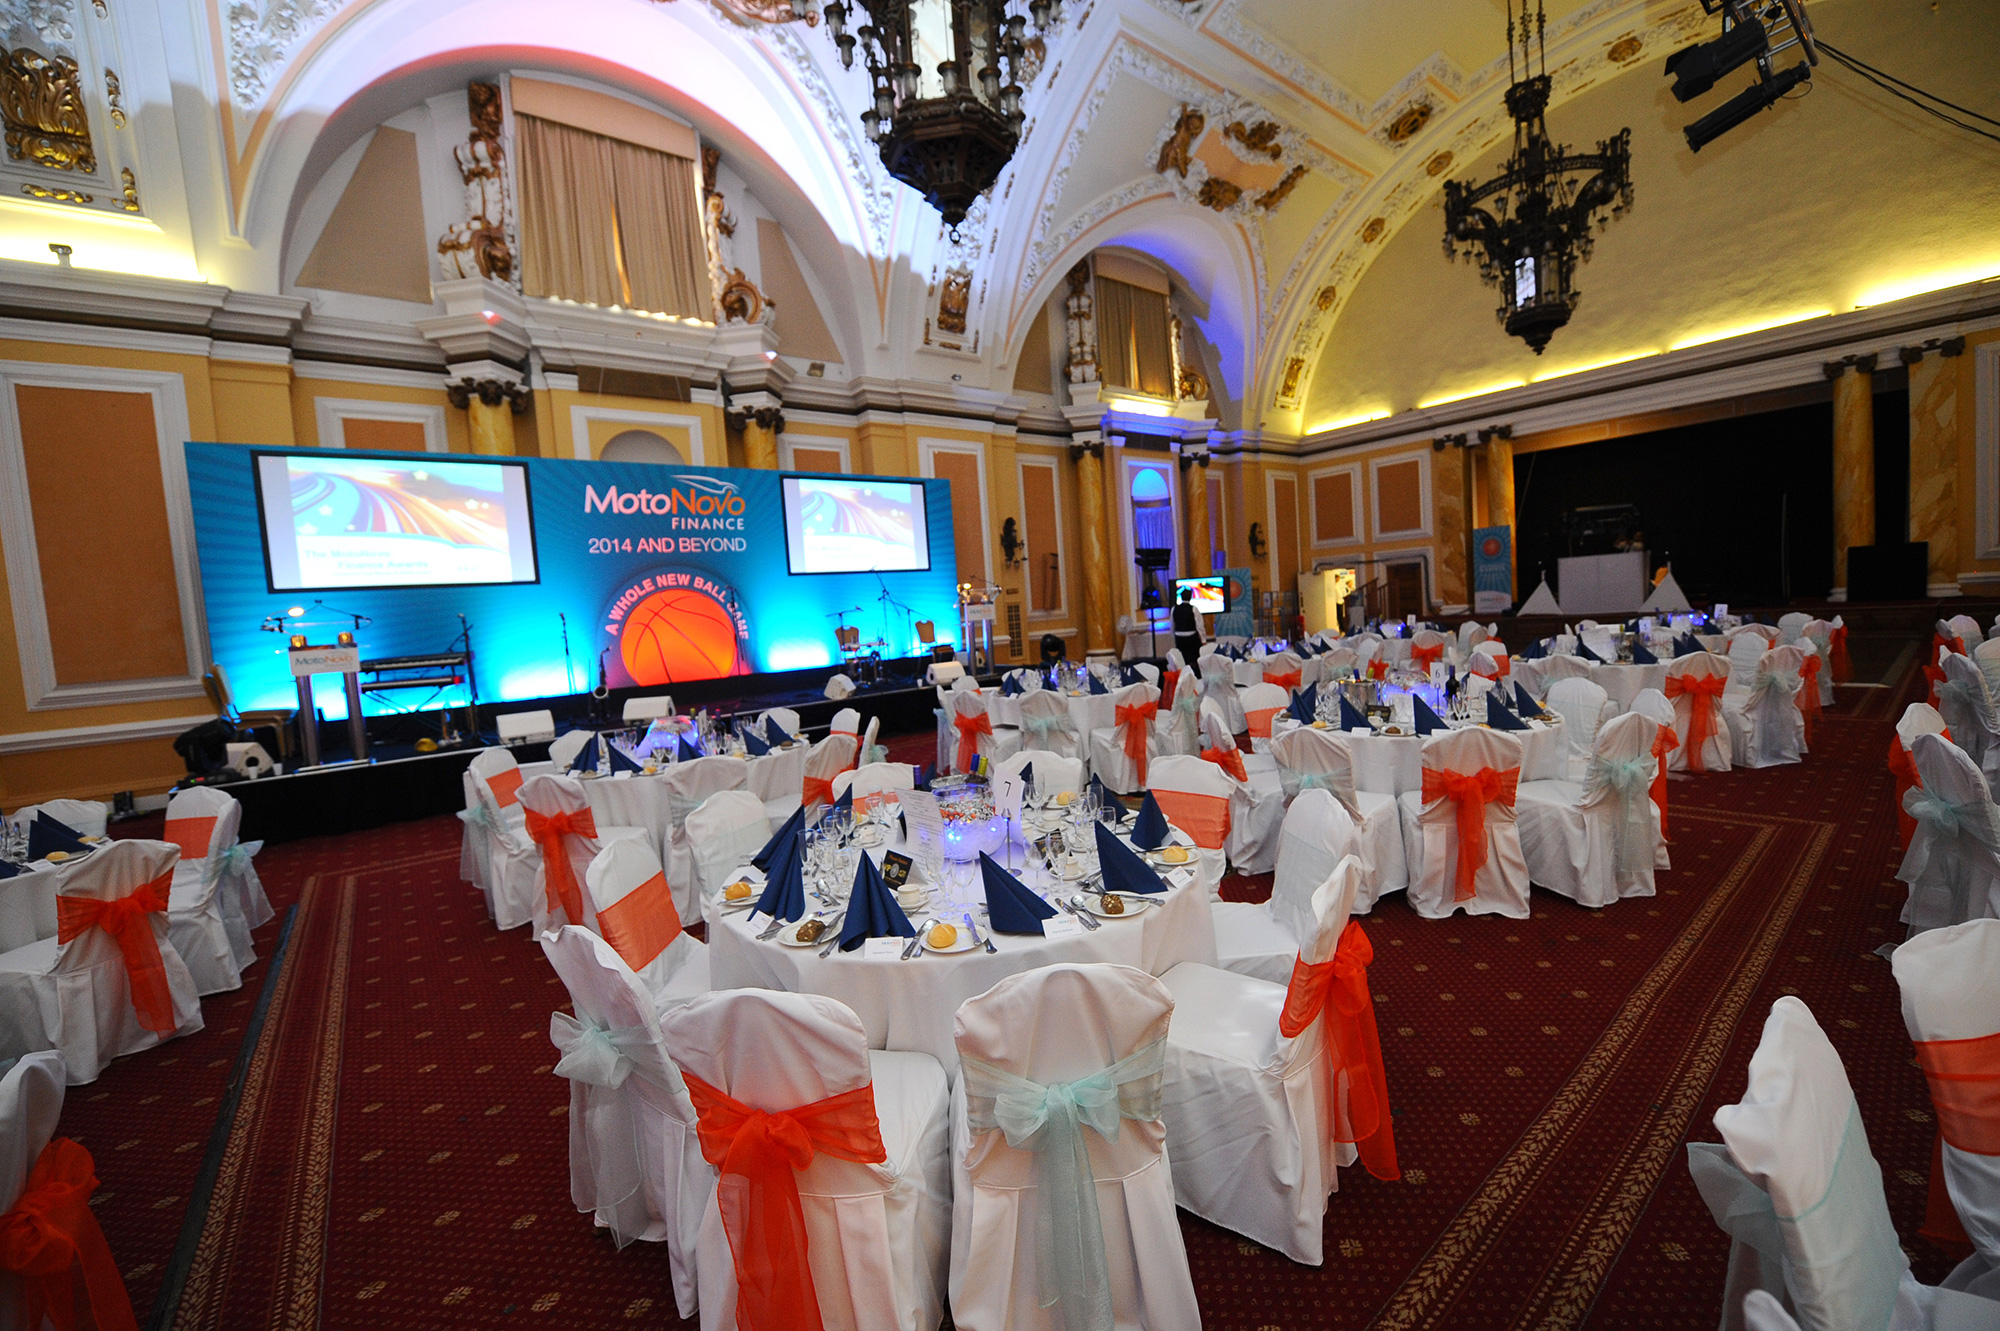 Motonova Conference Event Design